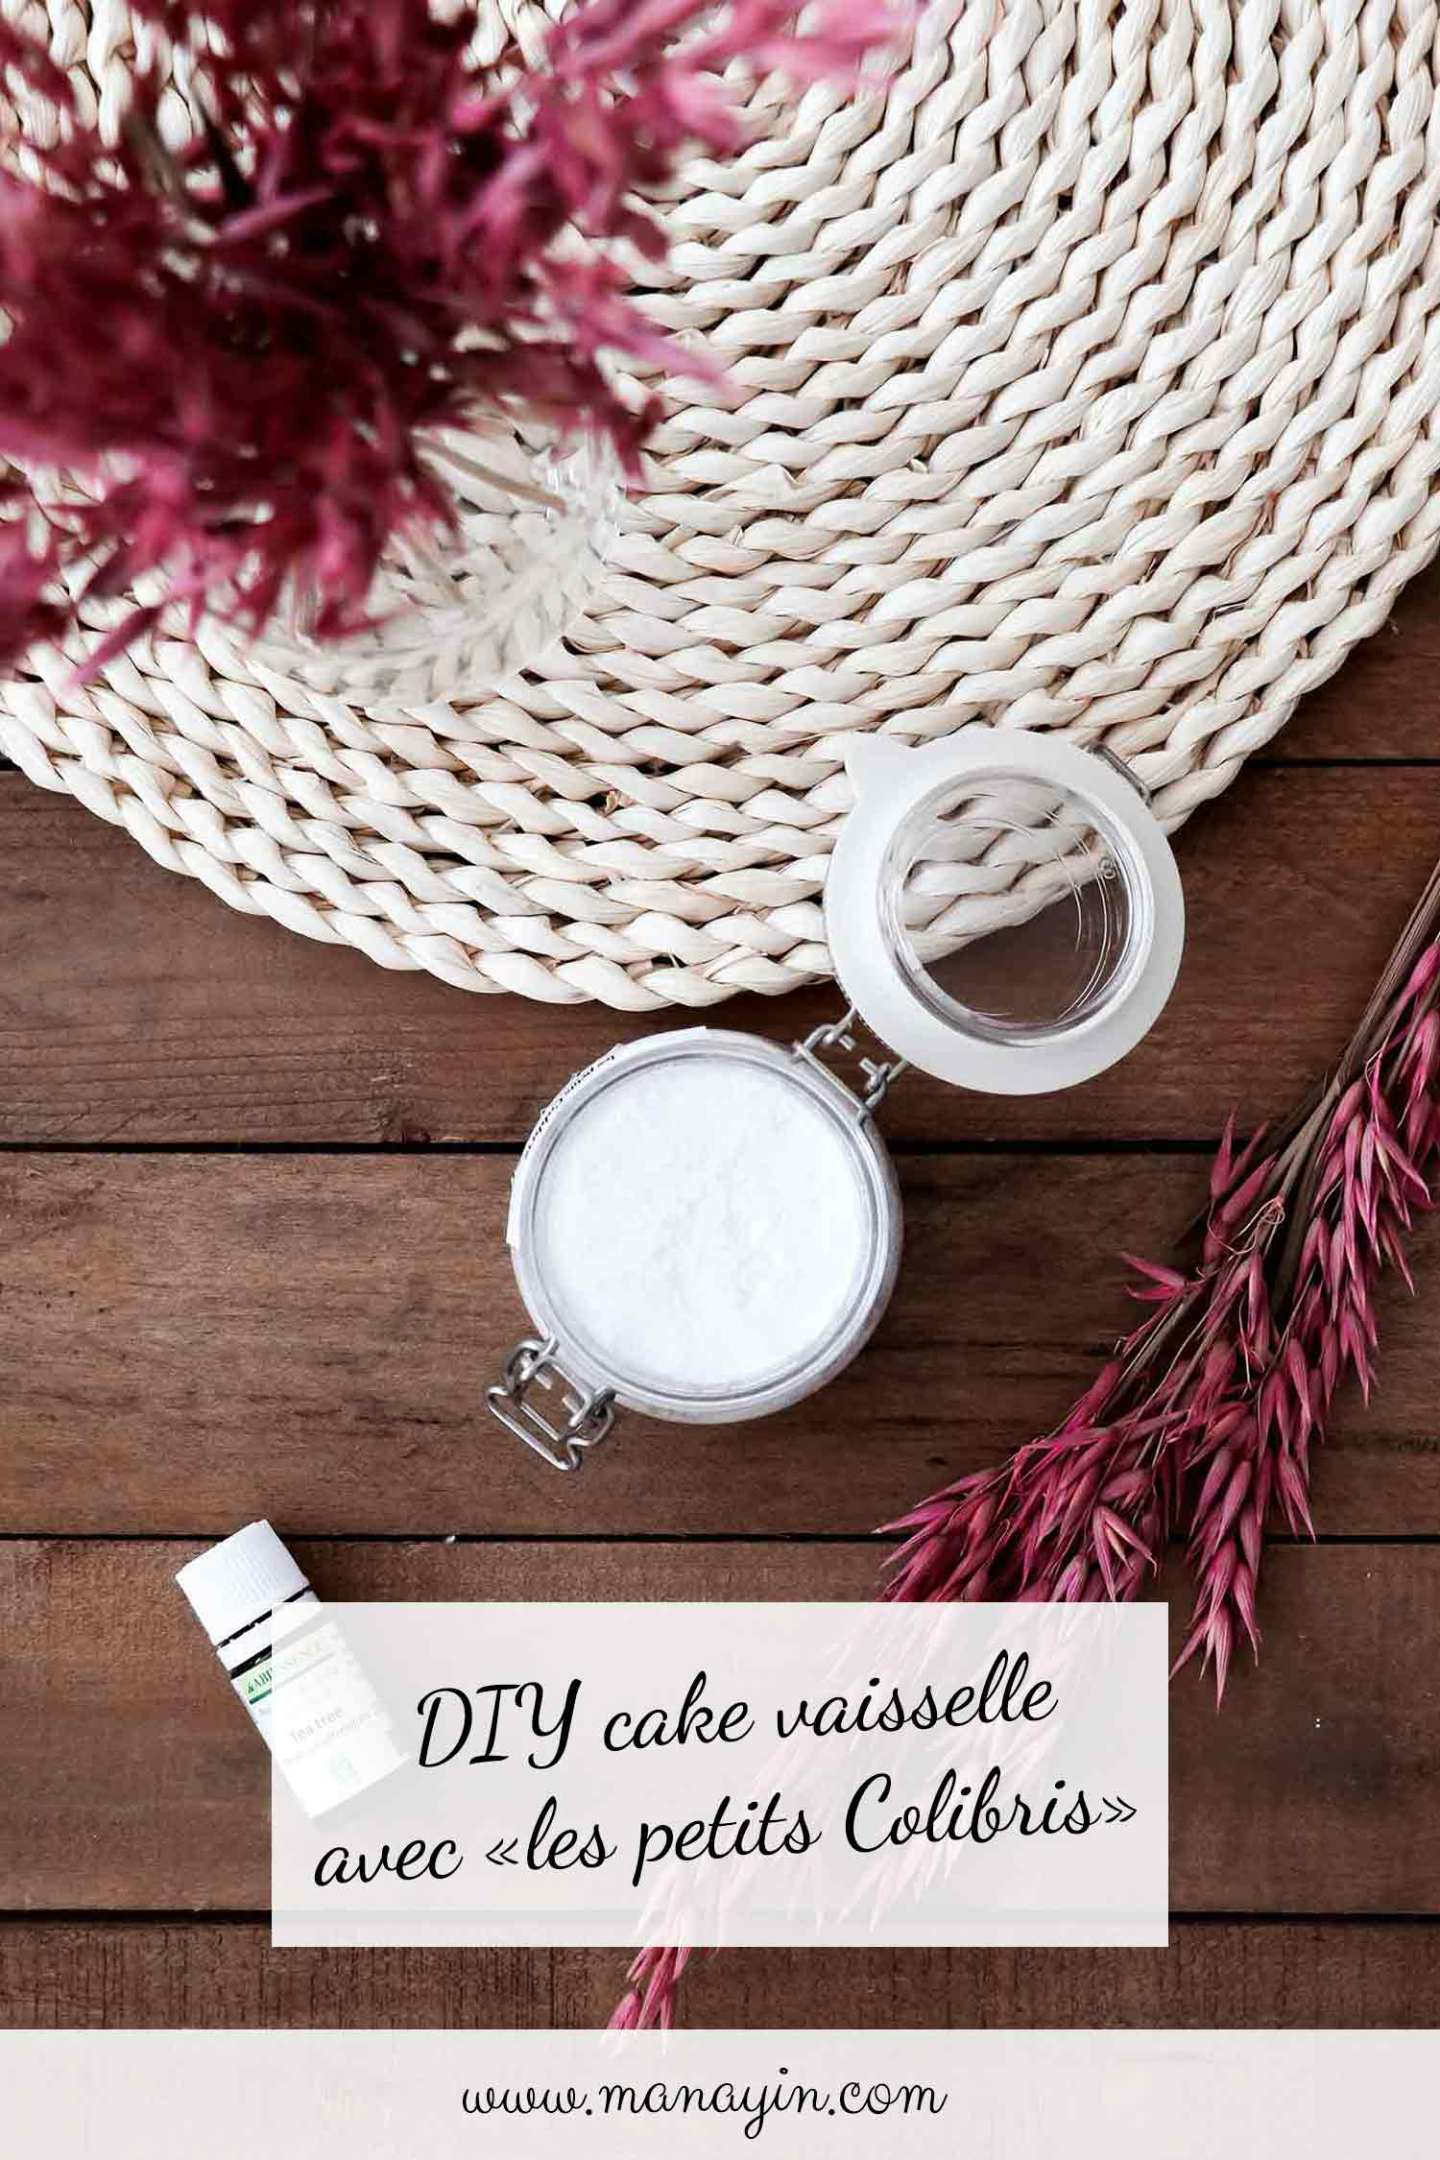 DIY cake vaisselle